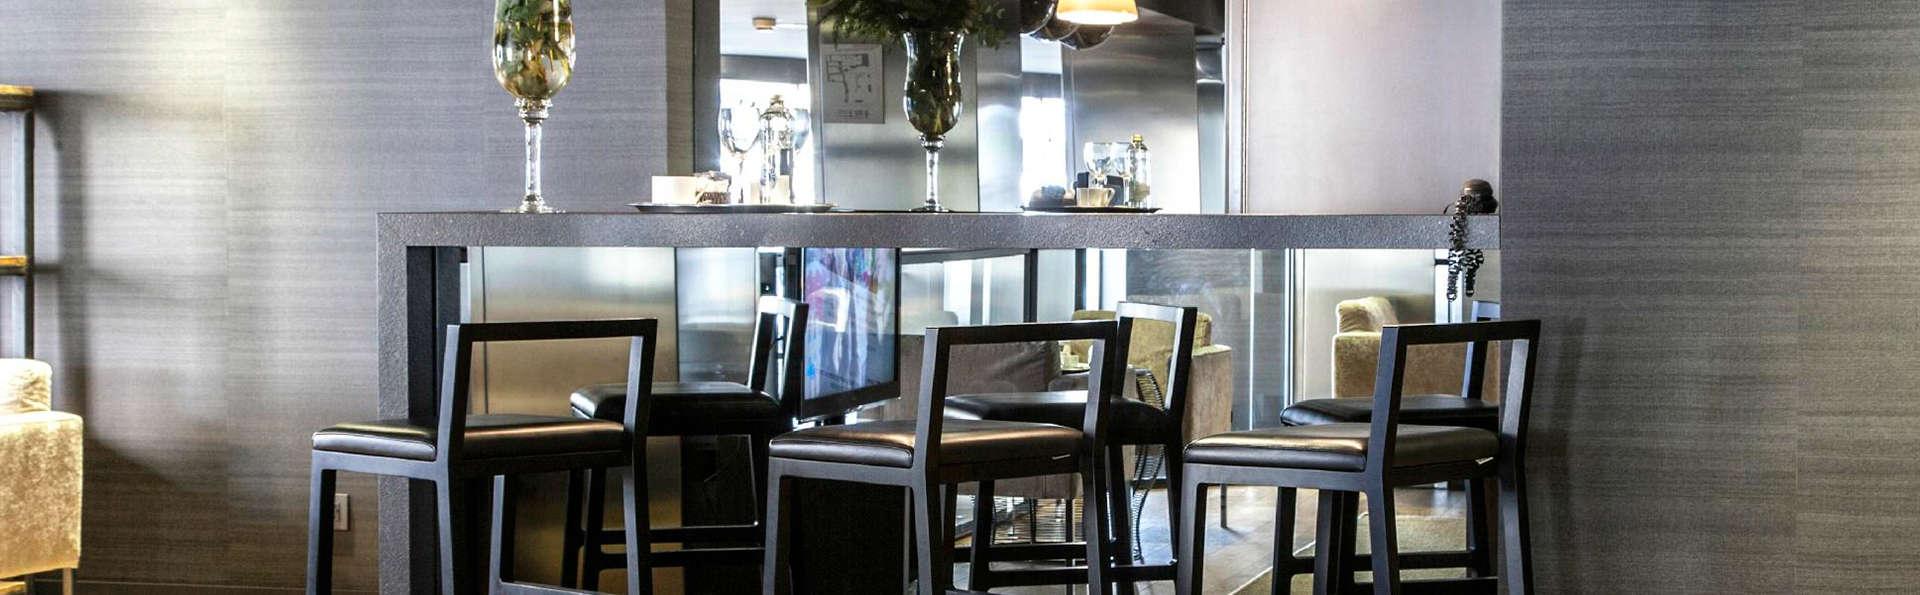 Escapada a Vigo con cena en un hotel de diseño